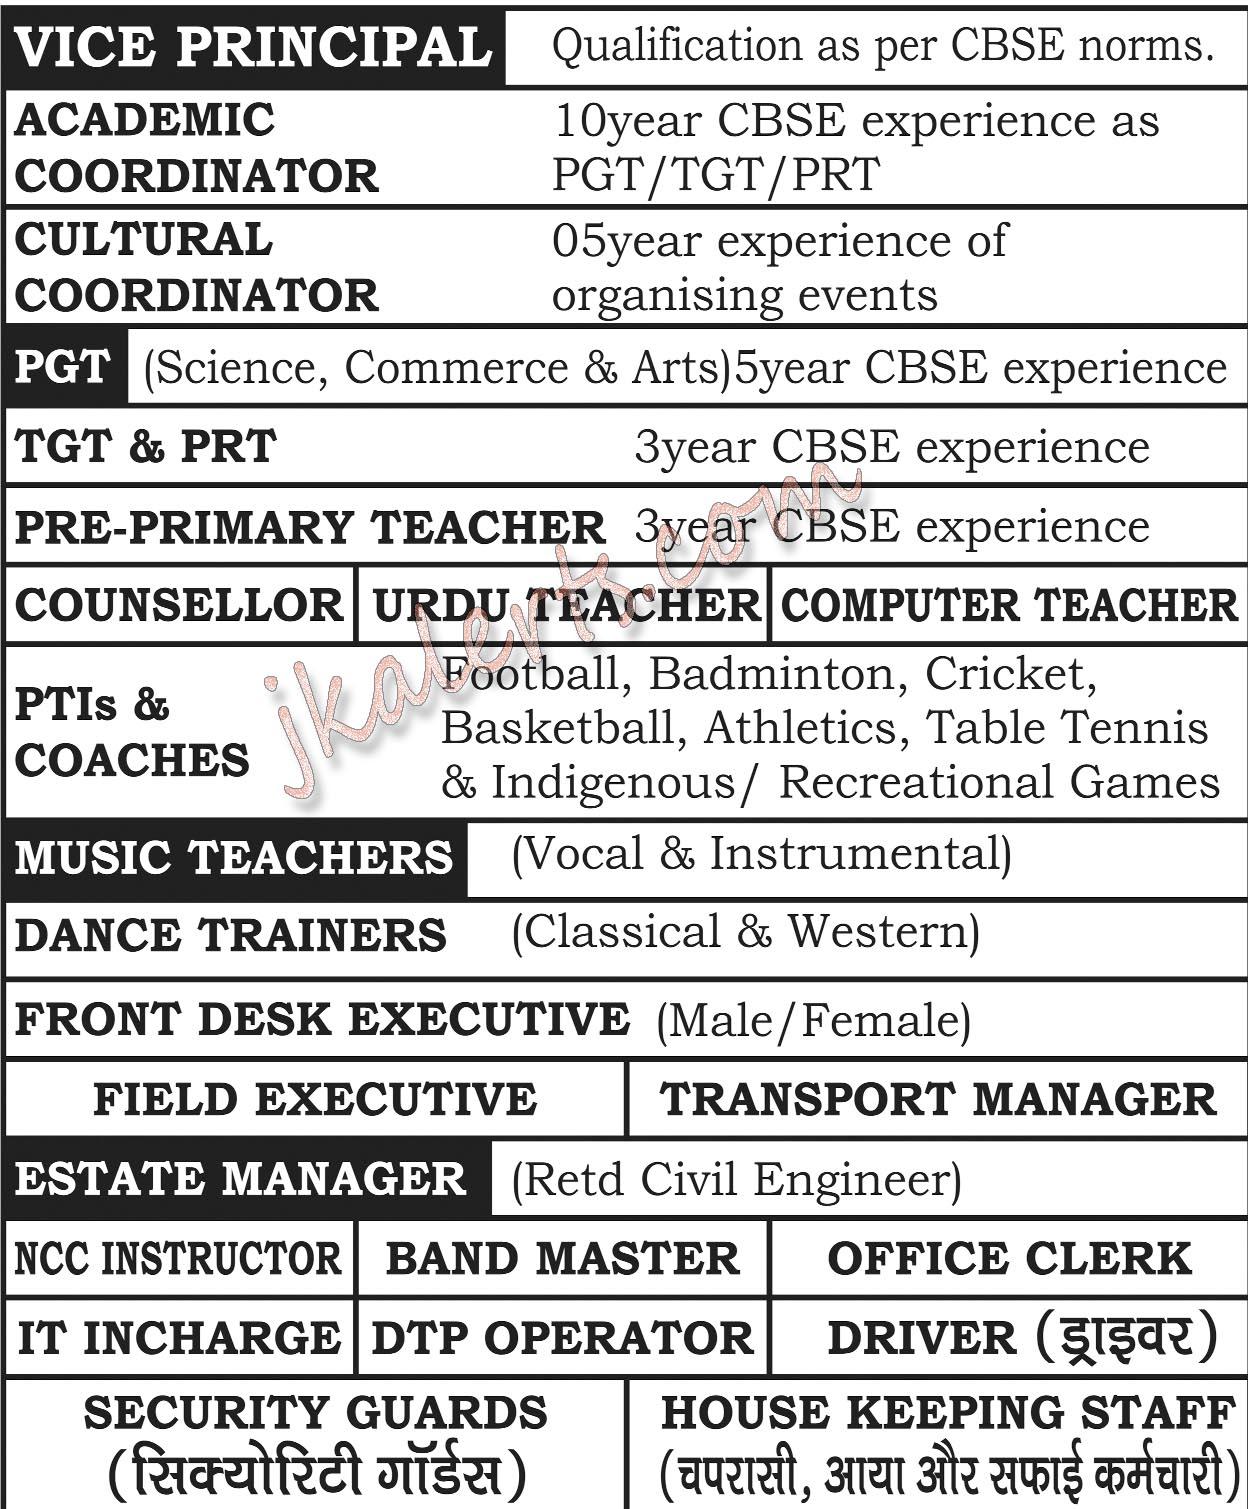 MV International School Recruitment 2020.